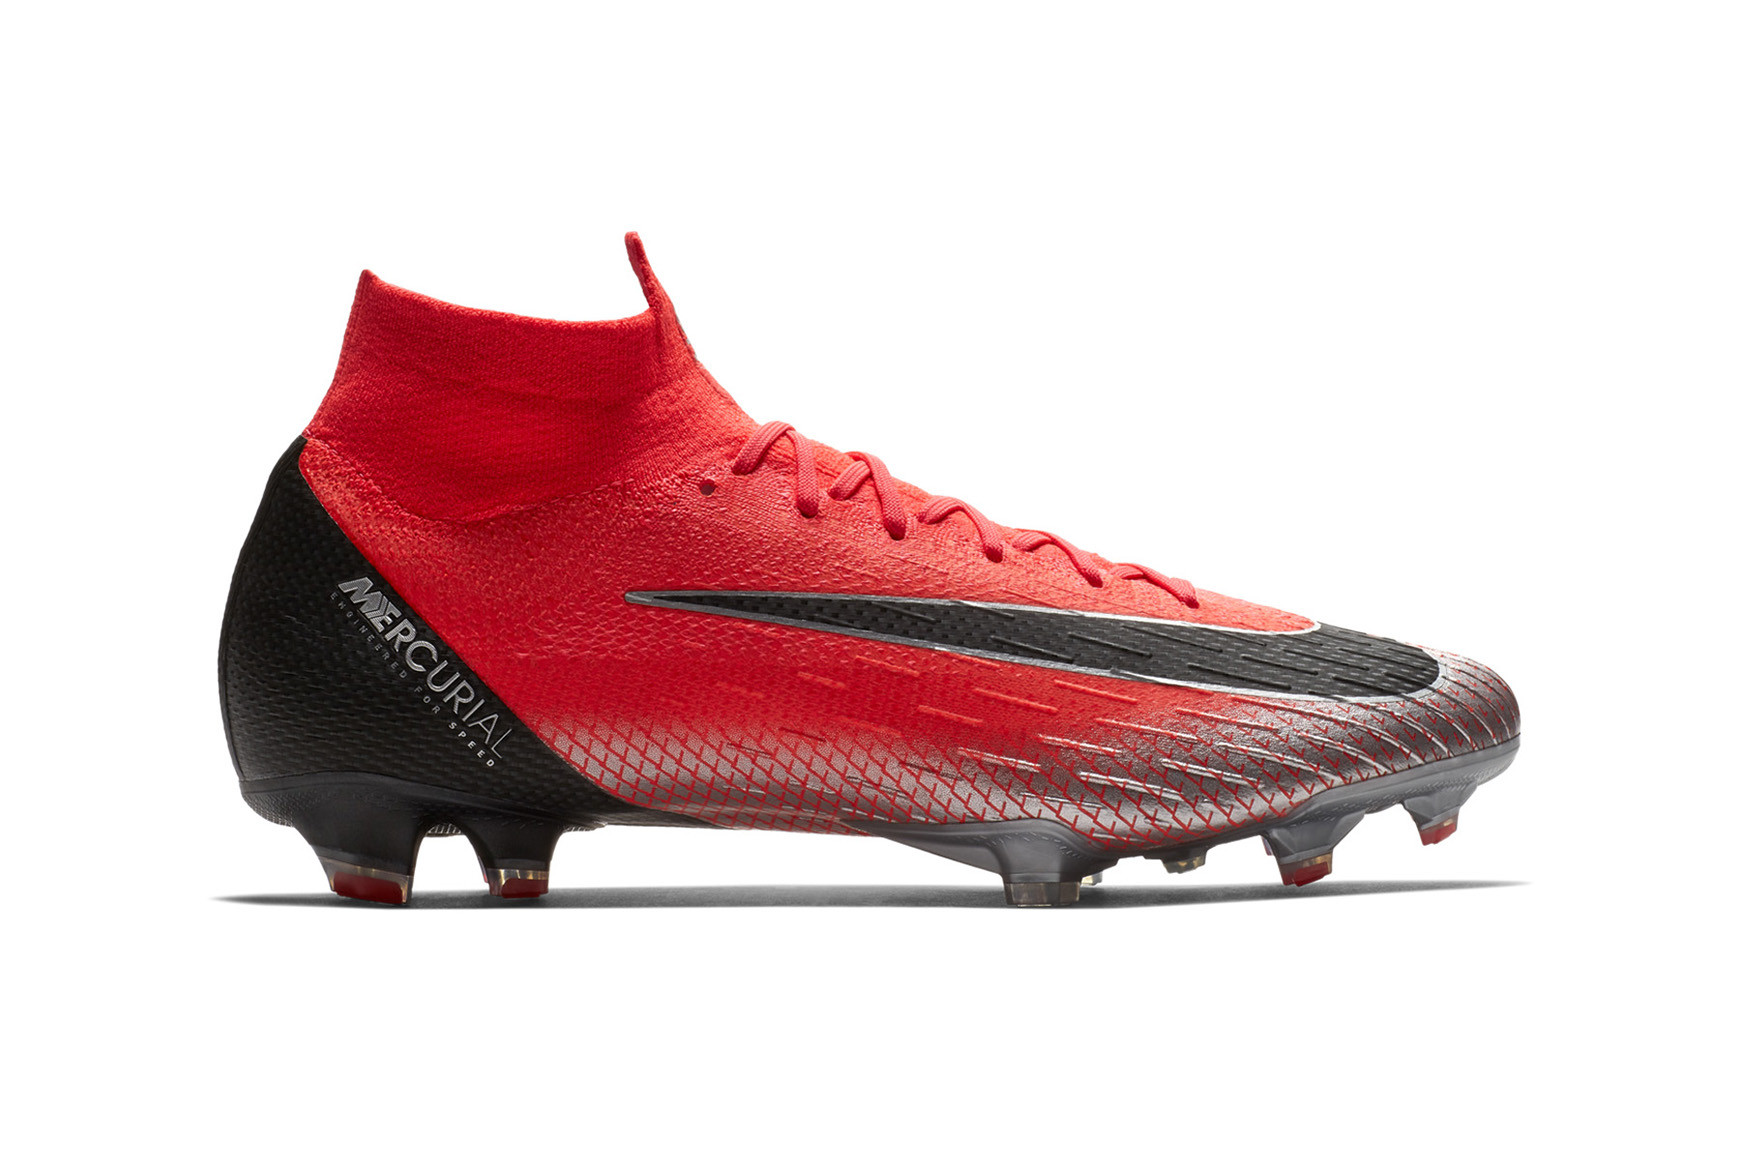 Nike vapor 9 cr7 sale up to 36% discounts